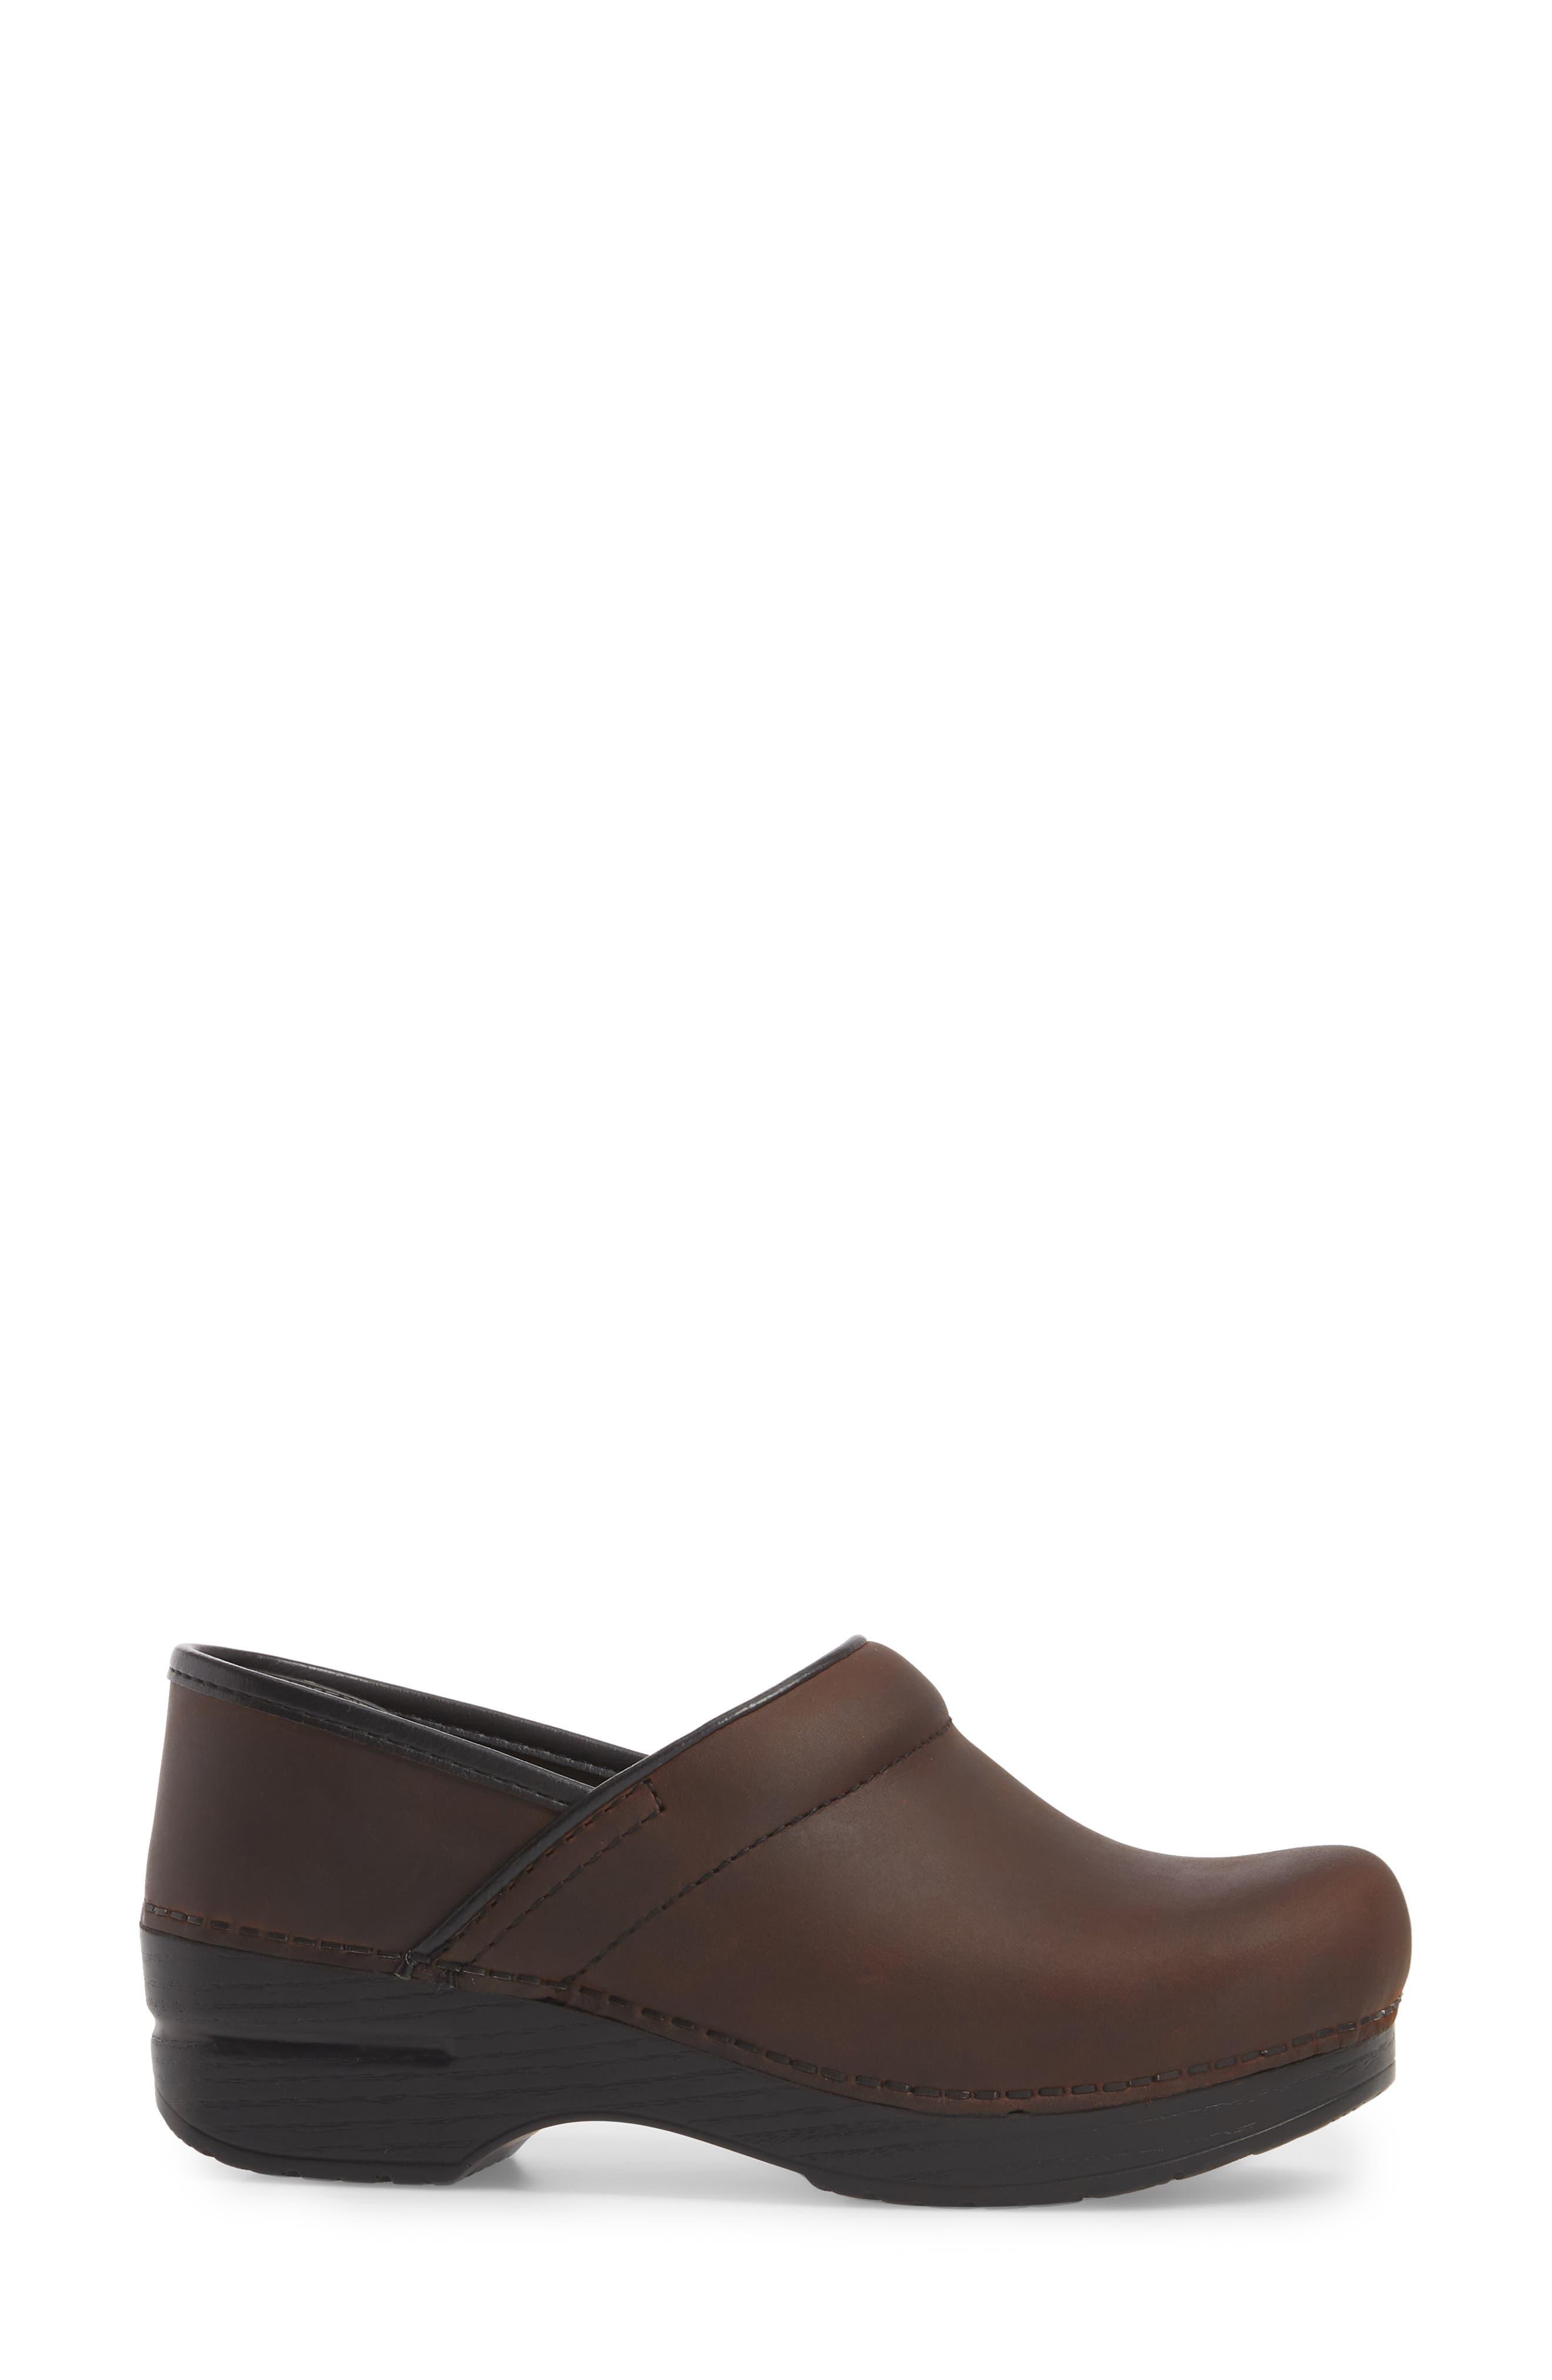 Wide Pro Clog,                             Alternate thumbnail 3, color,                             Antique Brown/ Black Leather